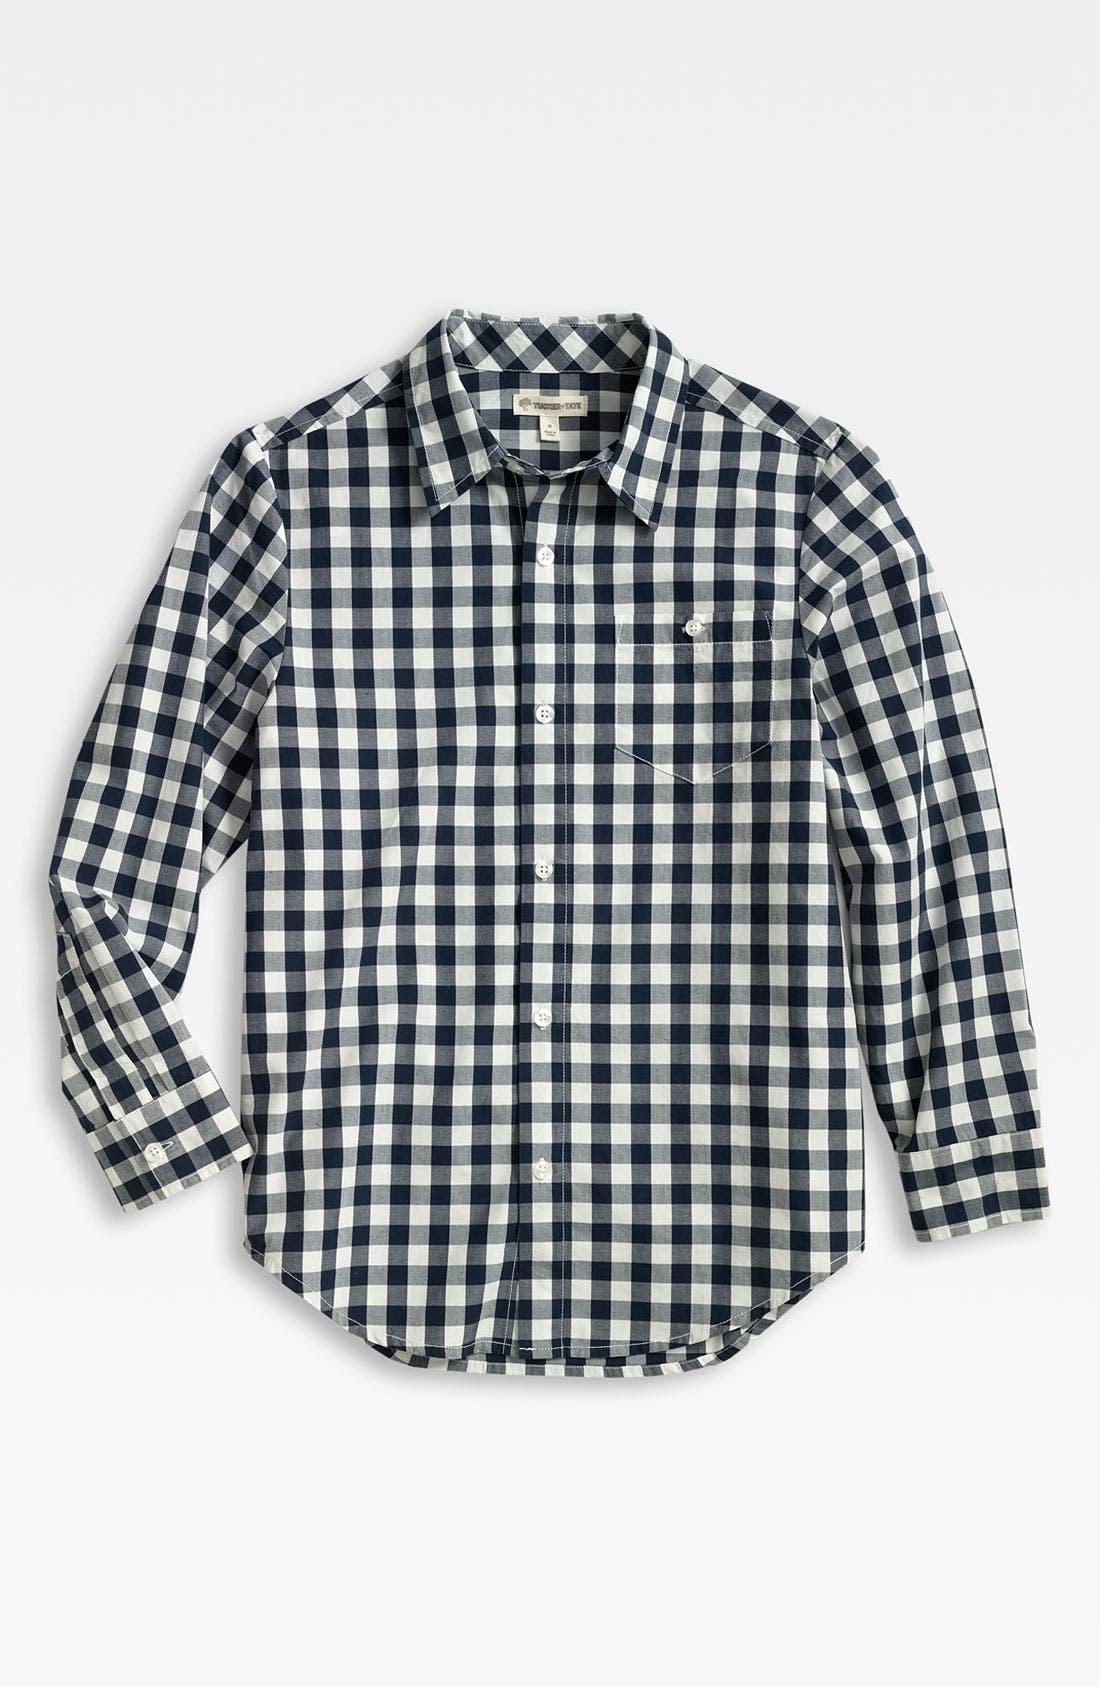 Alternate Image 1 Selected - Tucker + Tate 'Allen' Shirt (Big Boys)